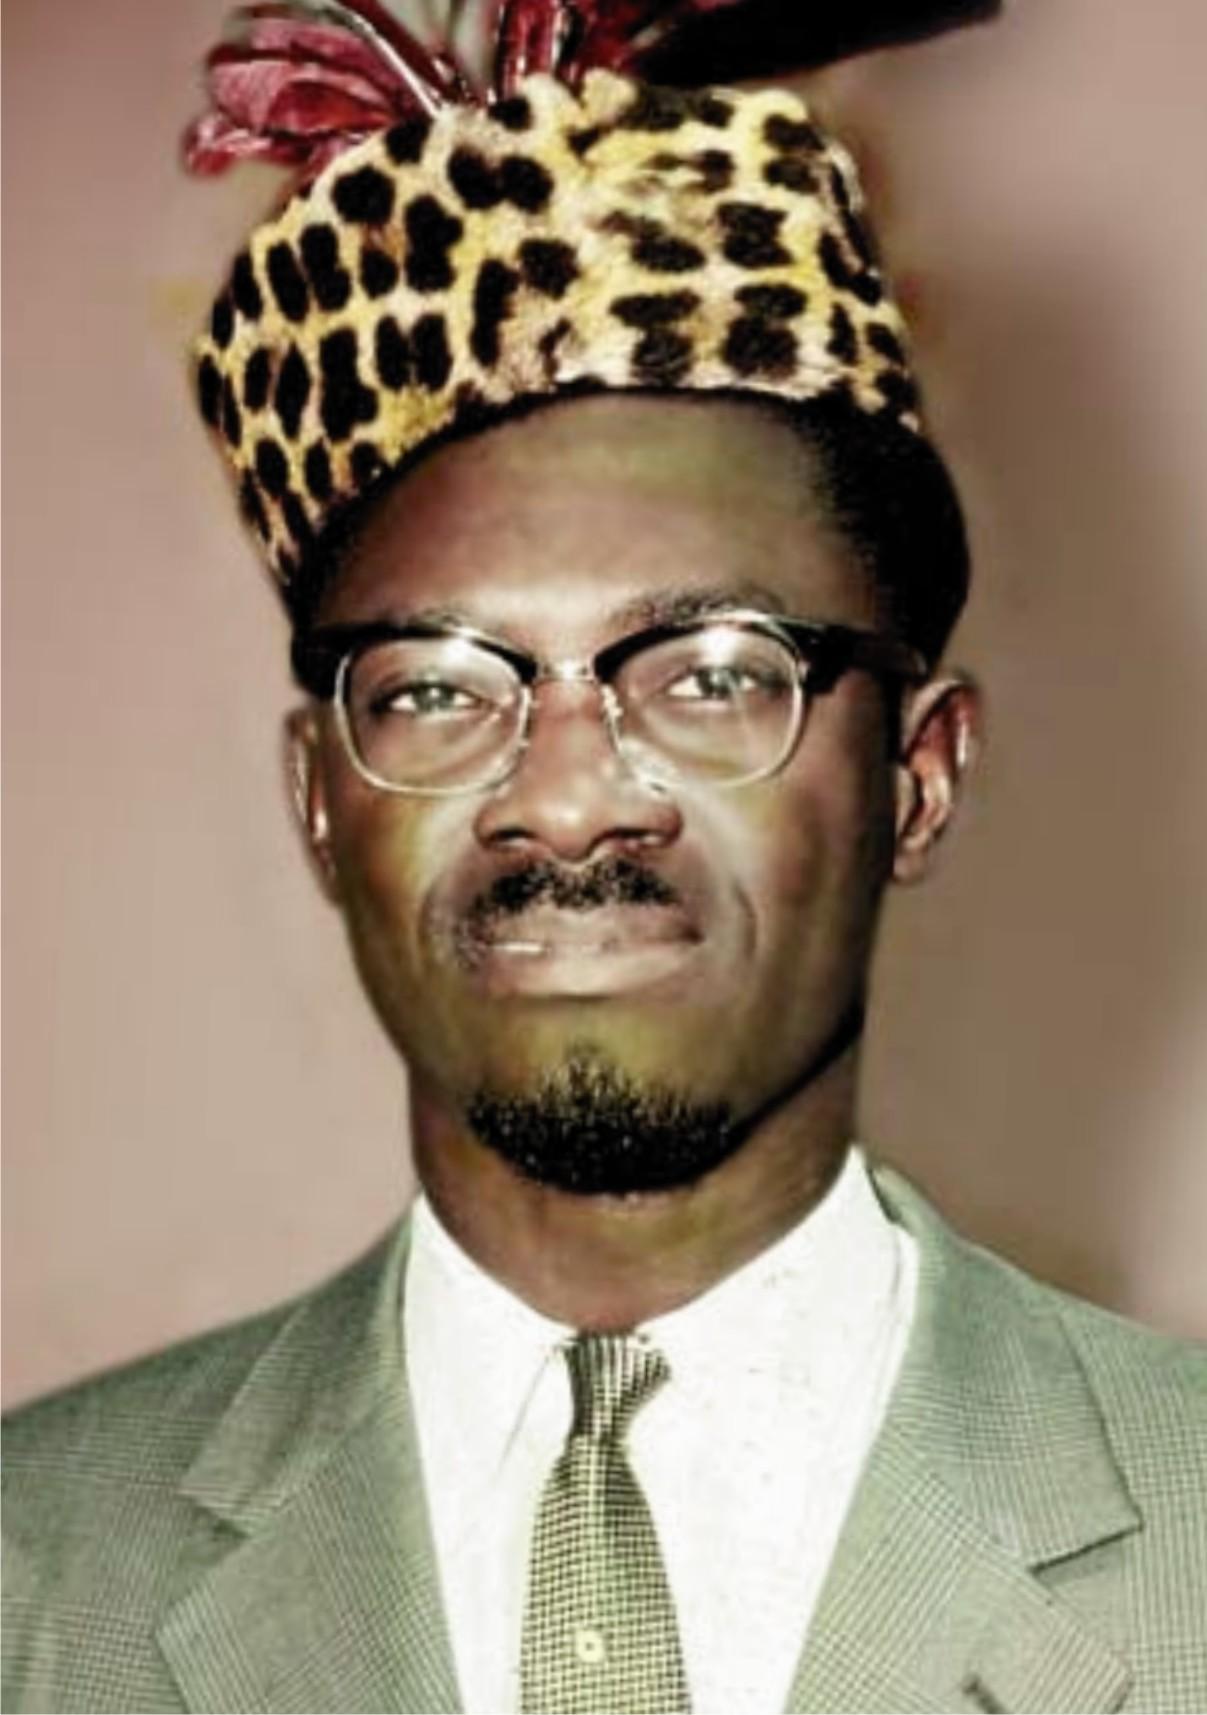 http://cdn.quotesgram.com/img/95/19/2105906240-Patrice-Lumumba-gorro.jpg